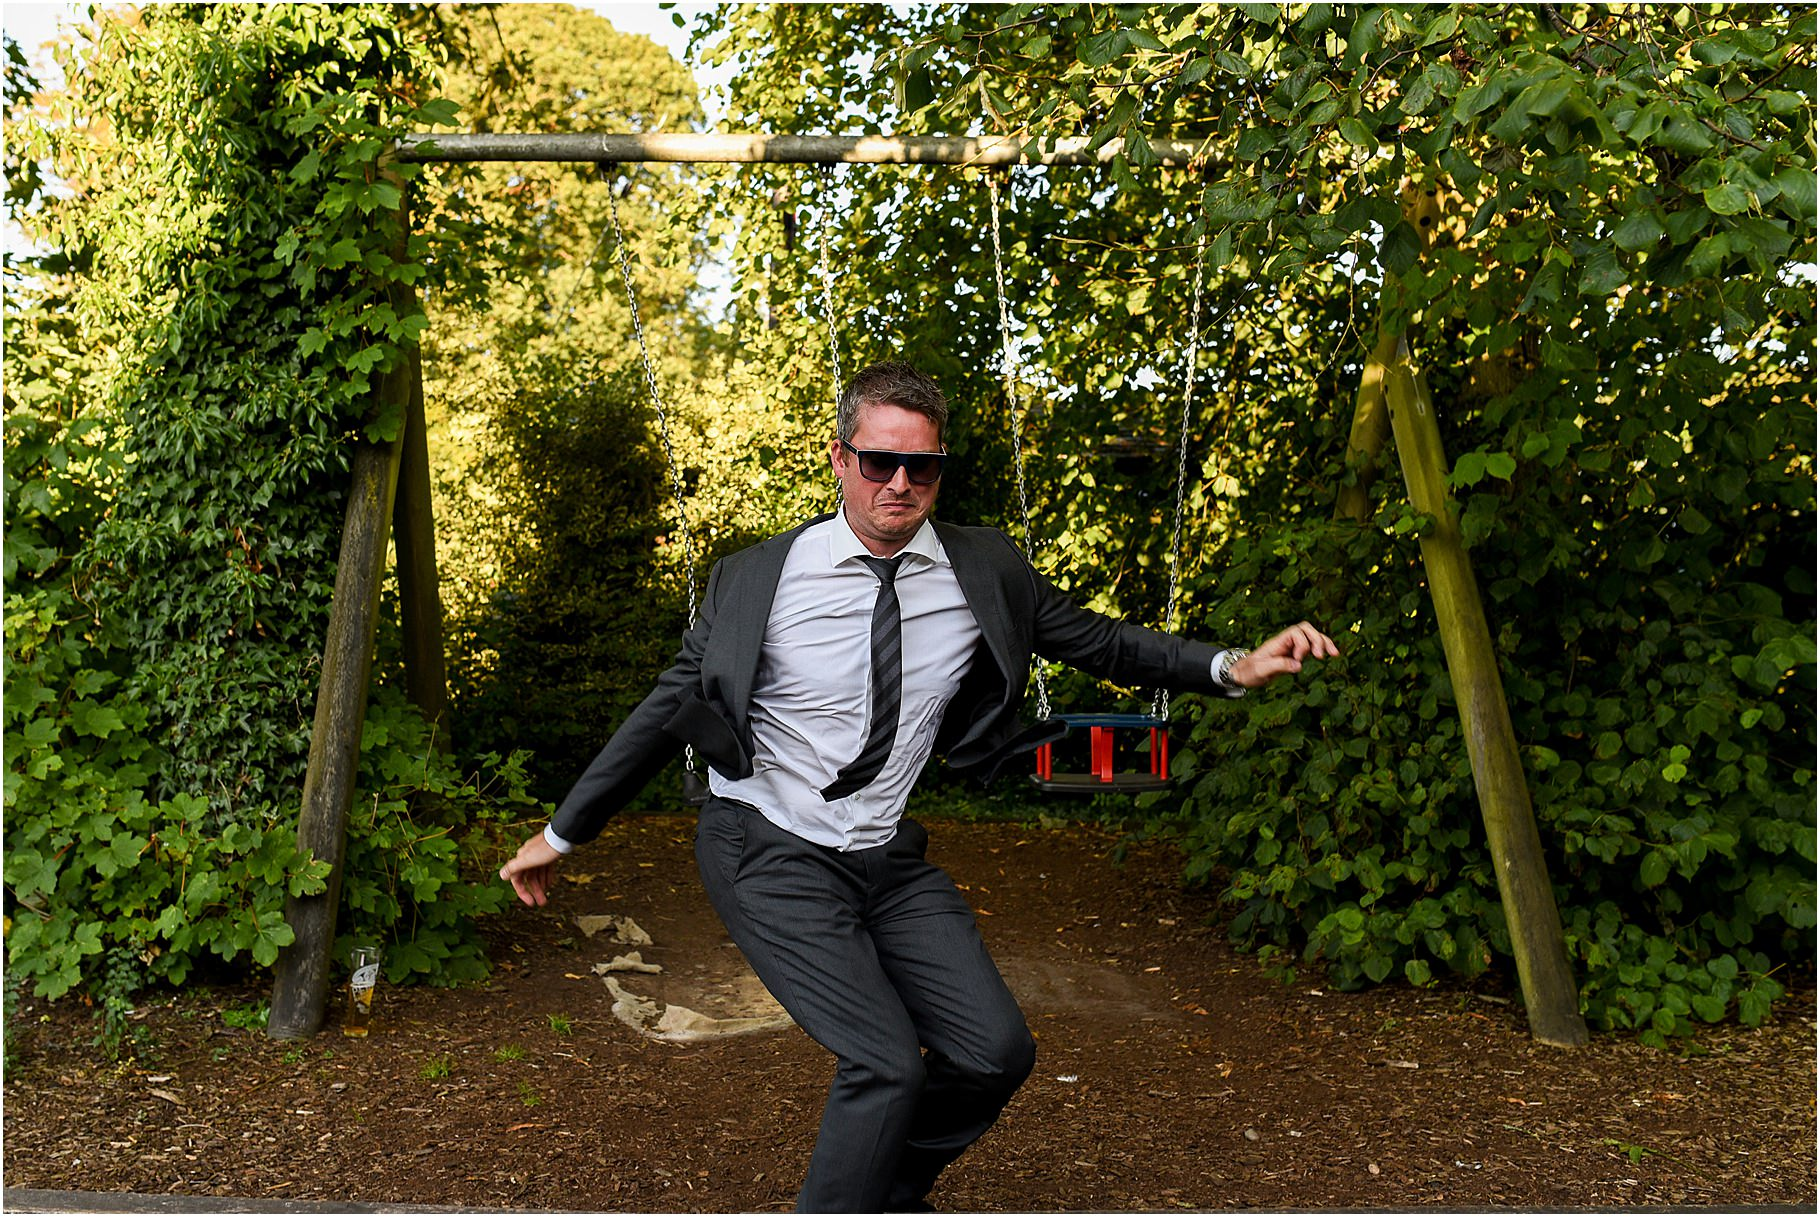 dan-wootton-photography-2017-weddings-033.jpg